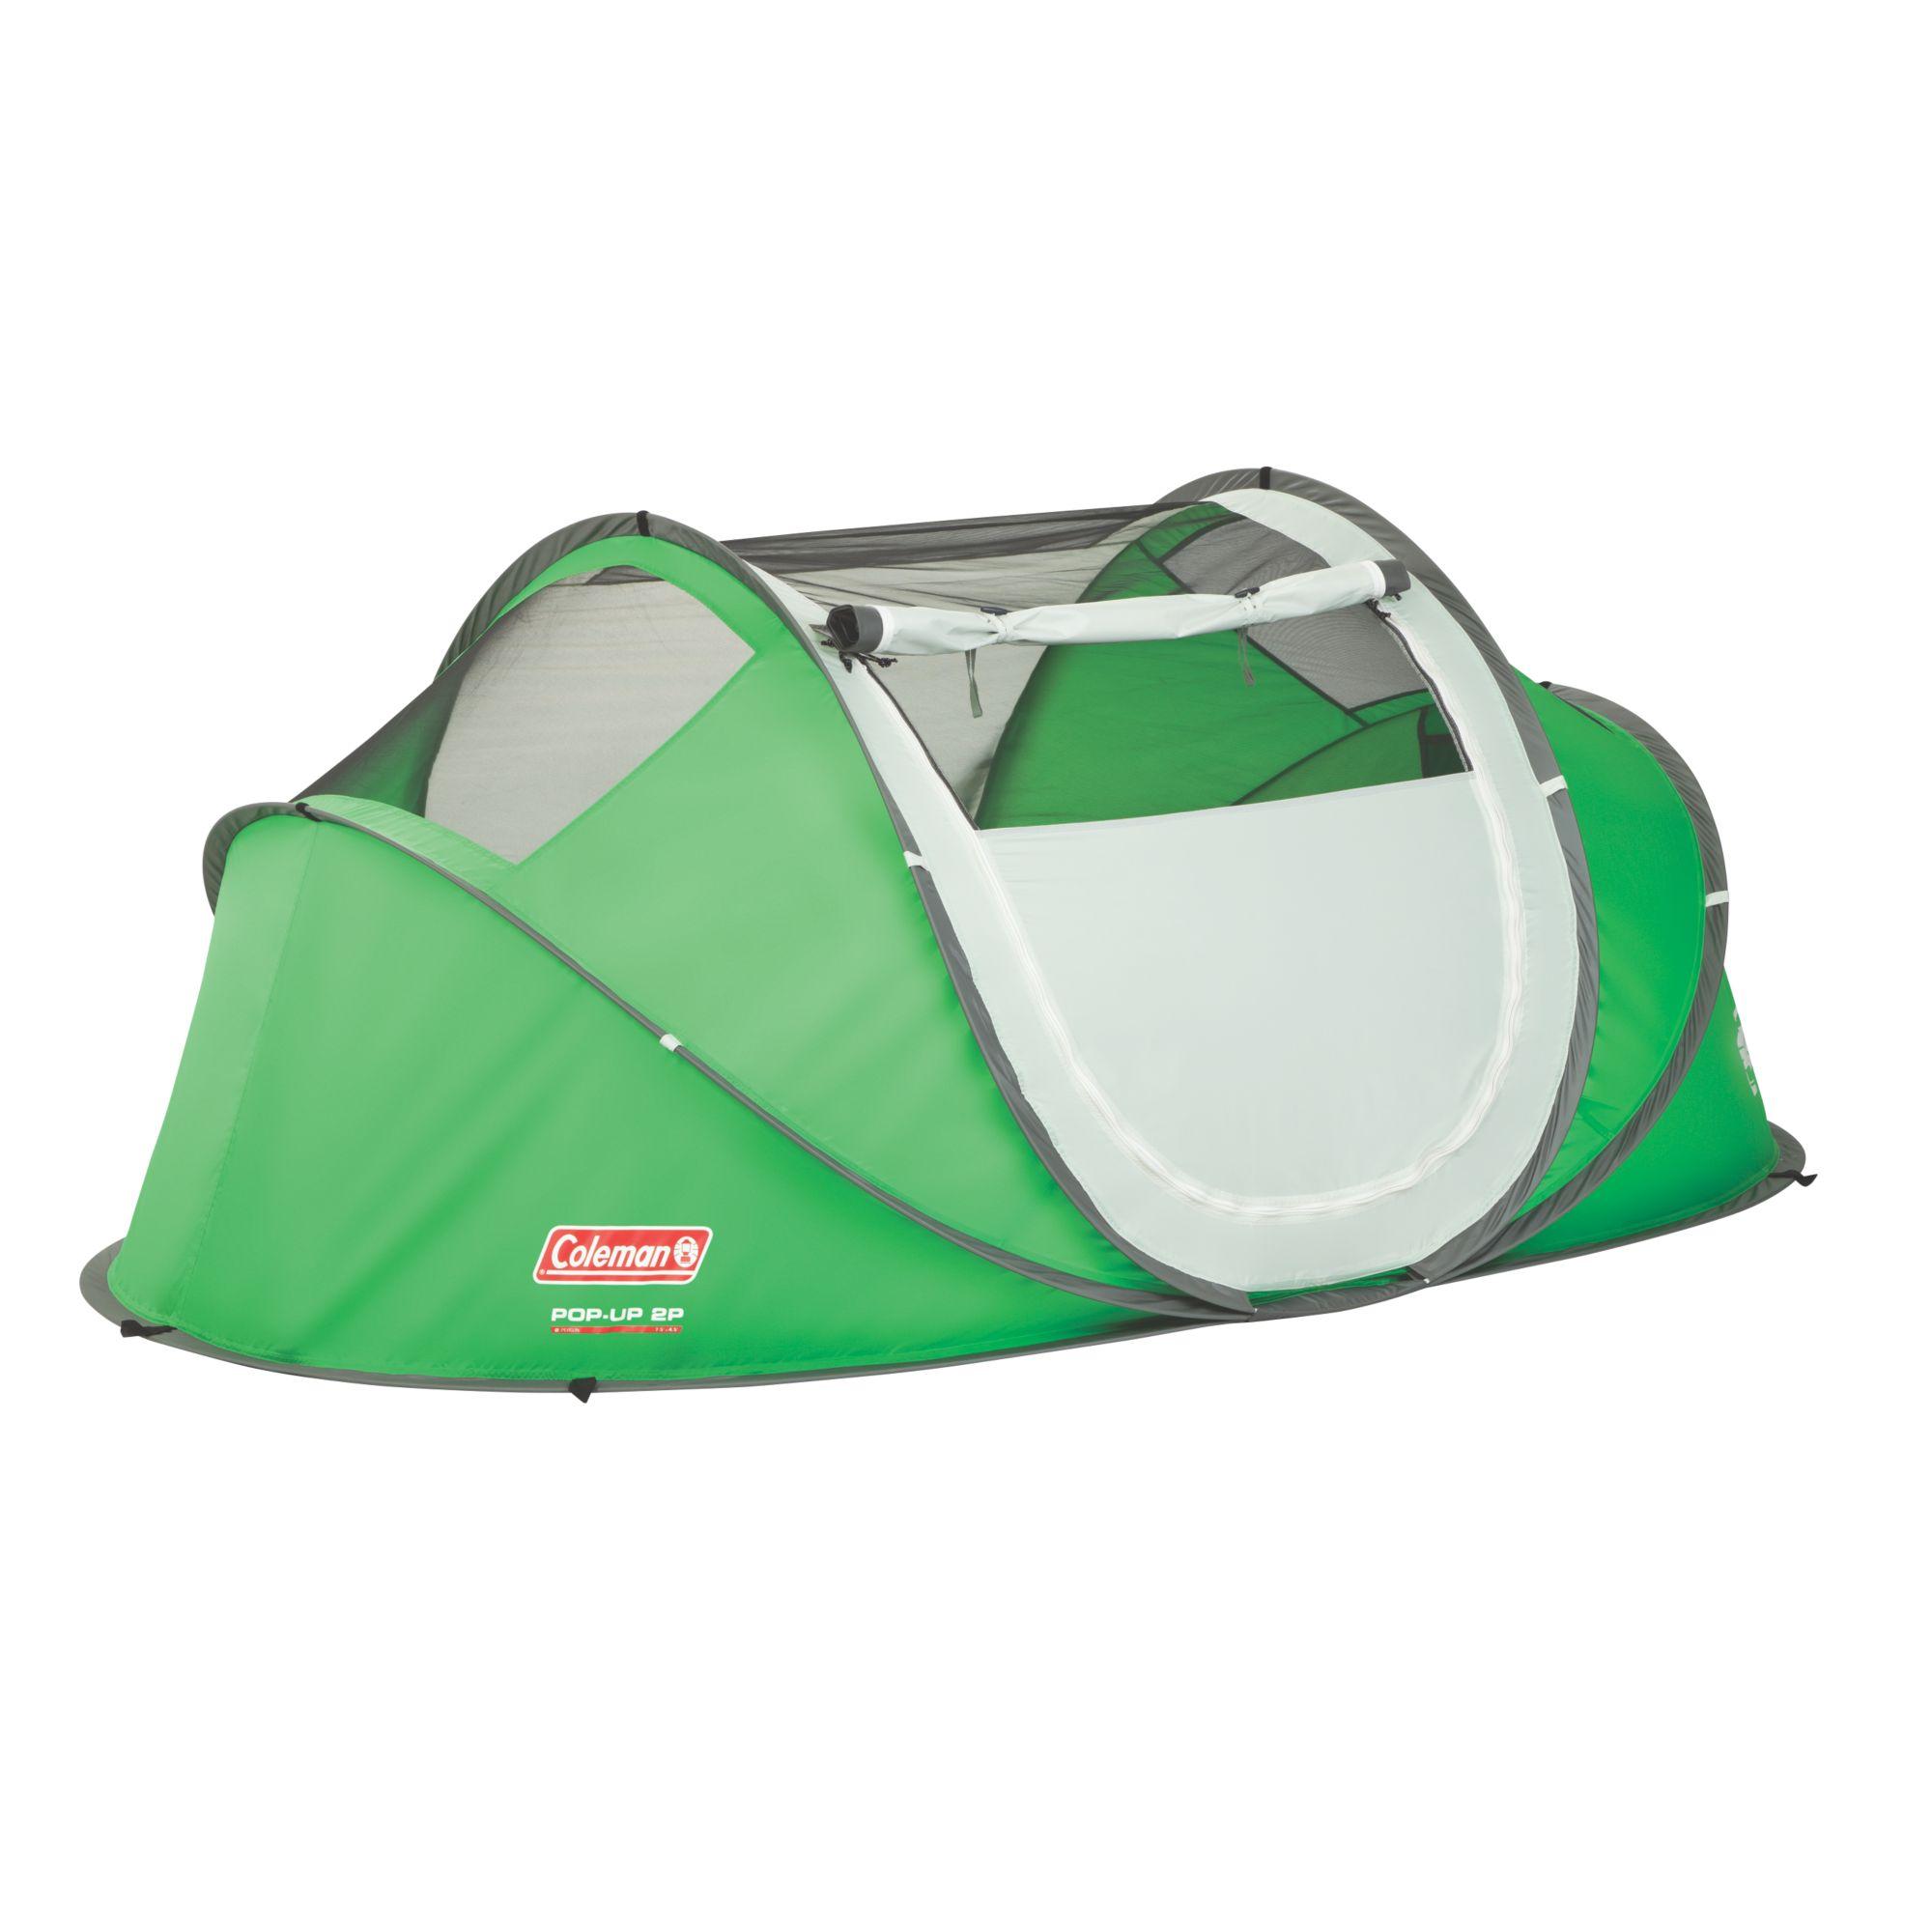 huge discount 5366a 19d21 2-Person Pop-Up Tent | Coleman